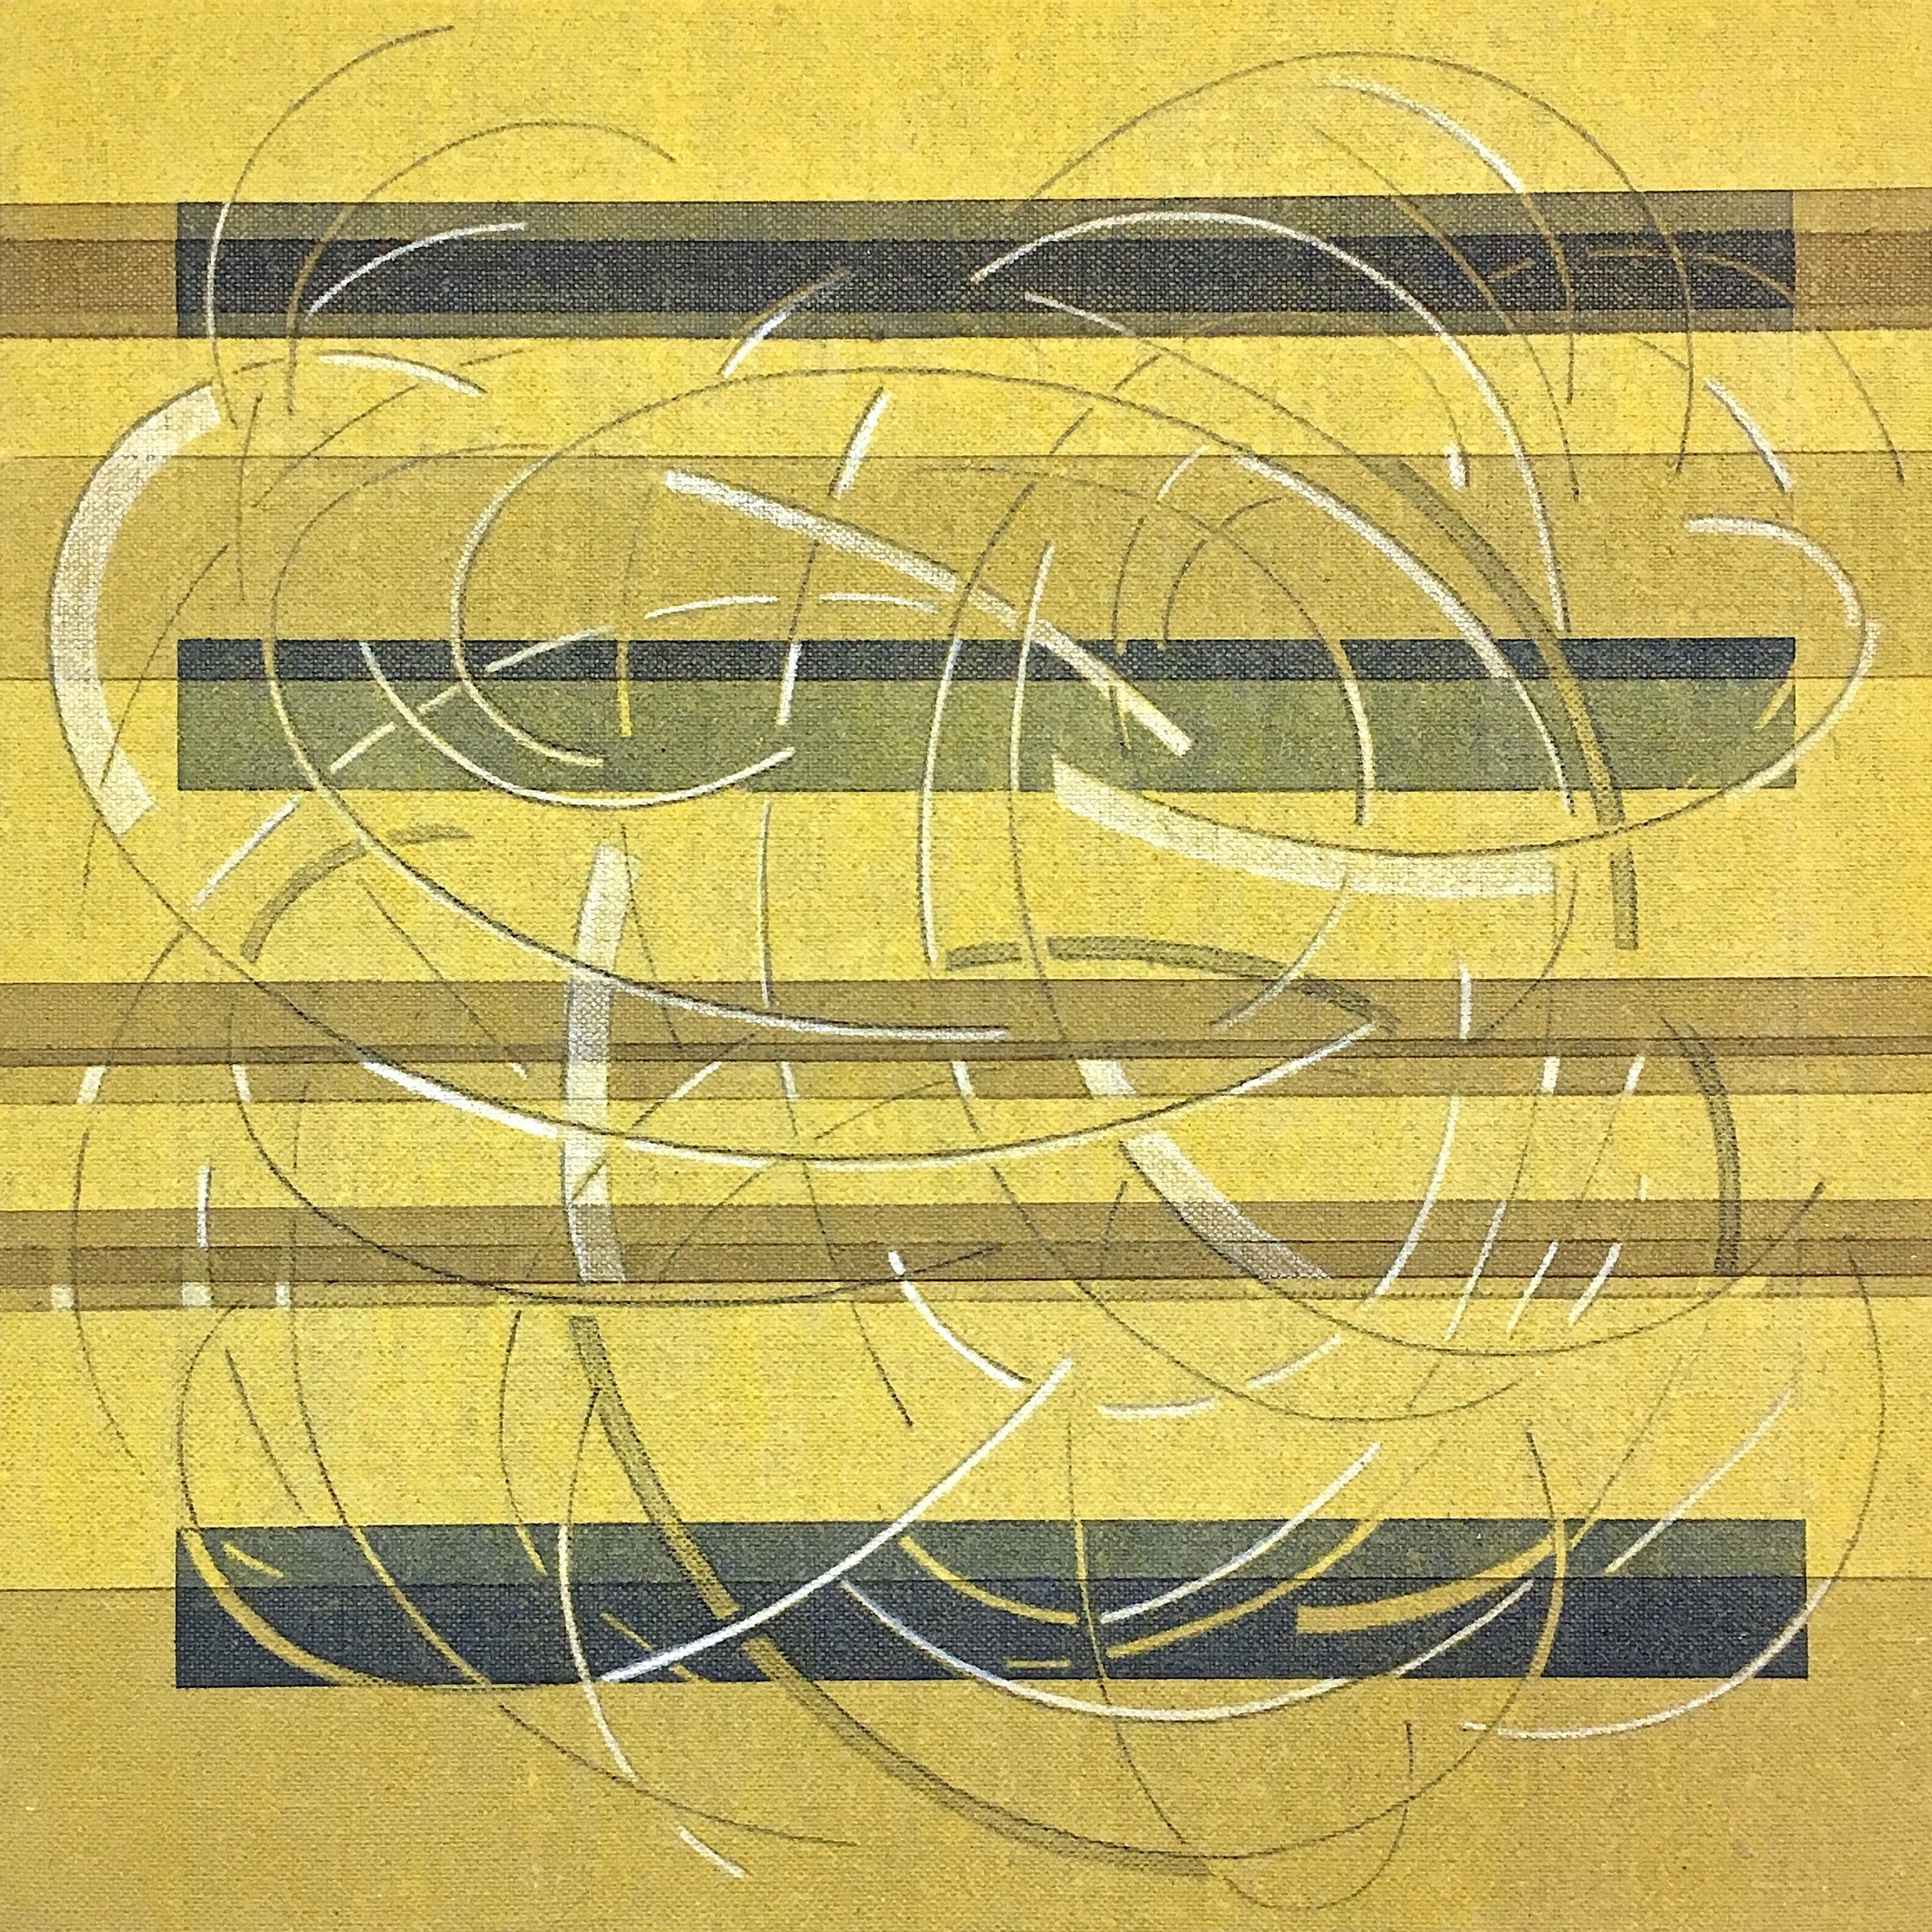 Every Other Line: Yellow Medium #1